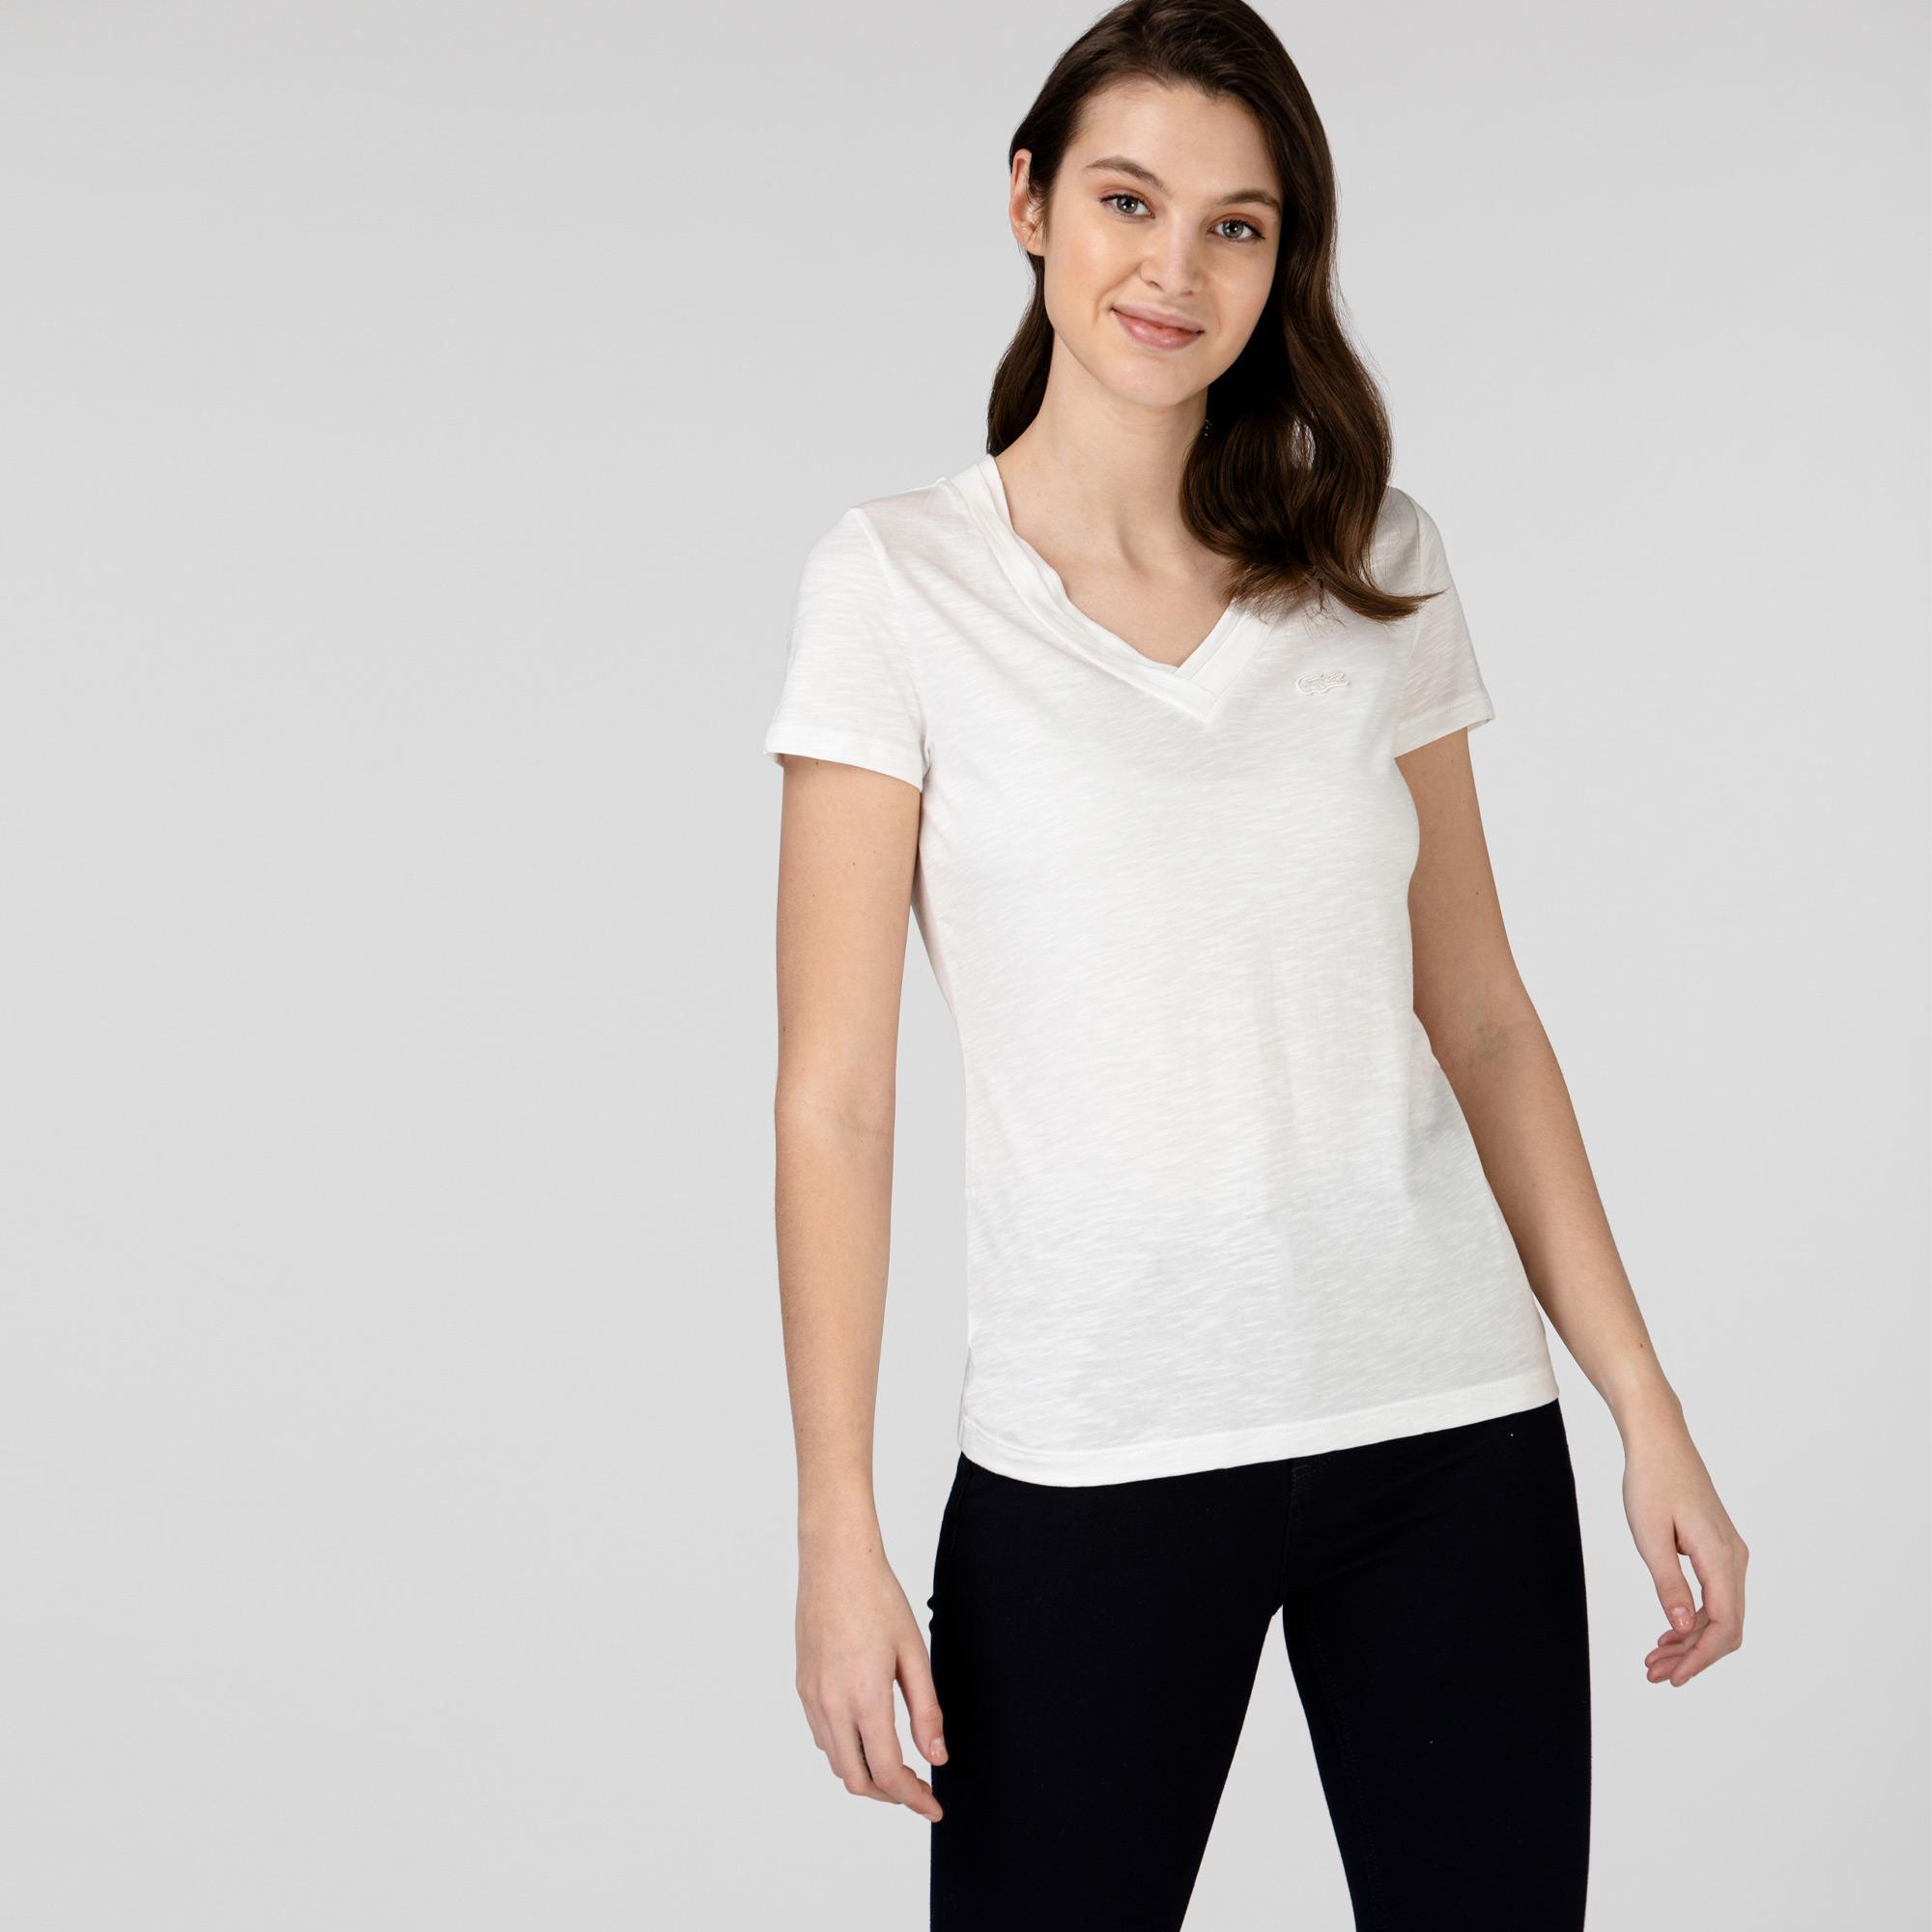 Lacoste Kadın Slim Fit V Yaka Beyaz T-Shirt